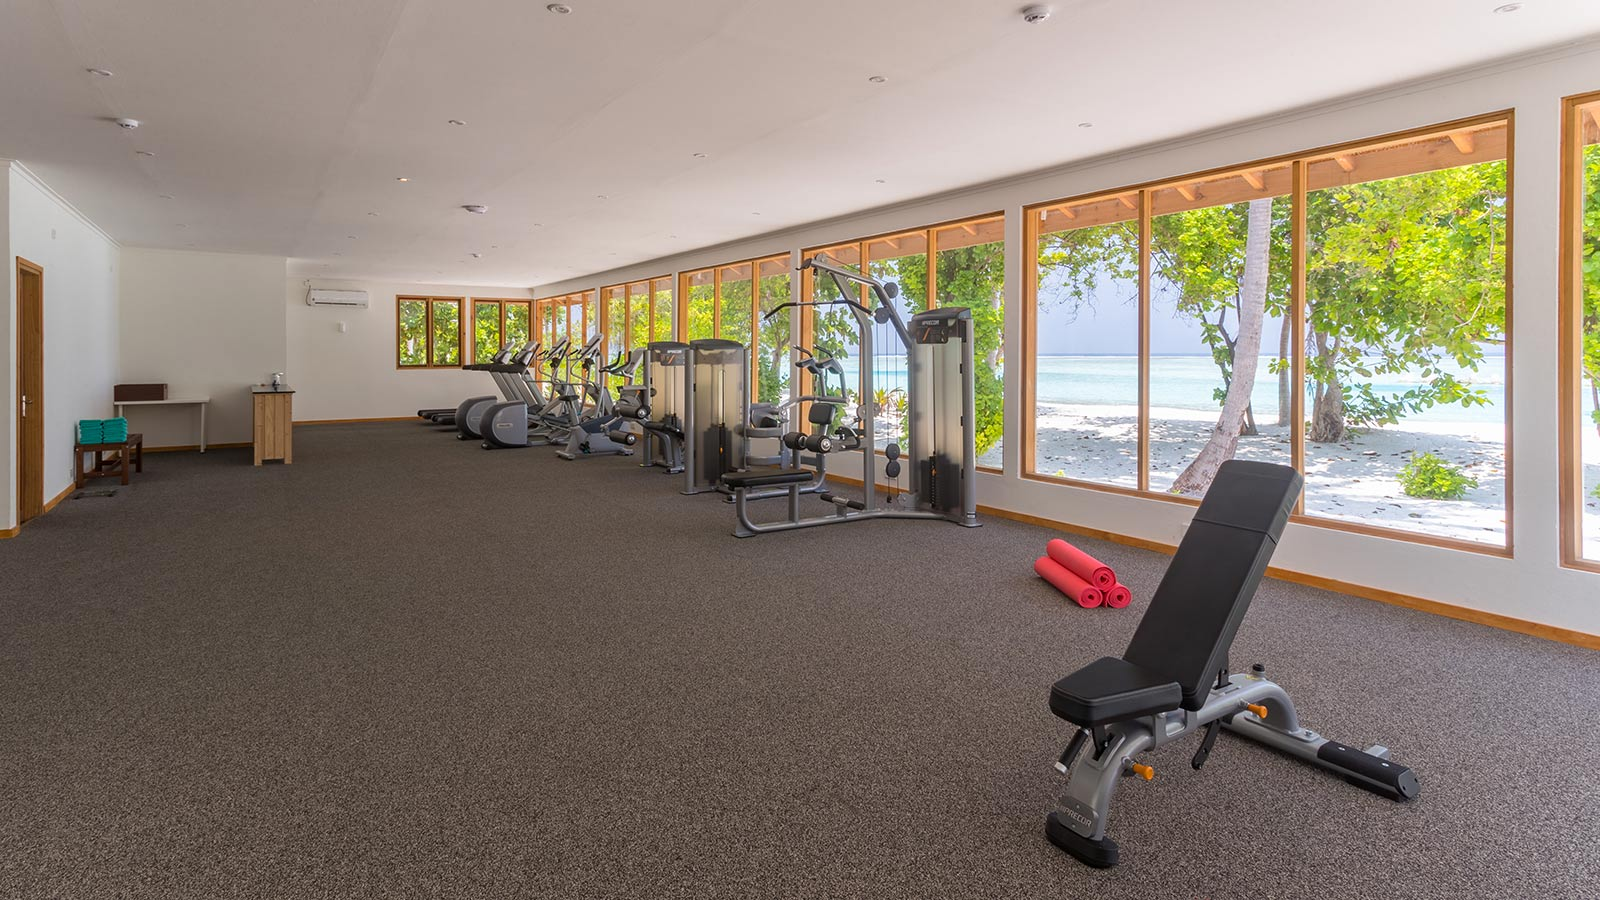 Innahura Gym